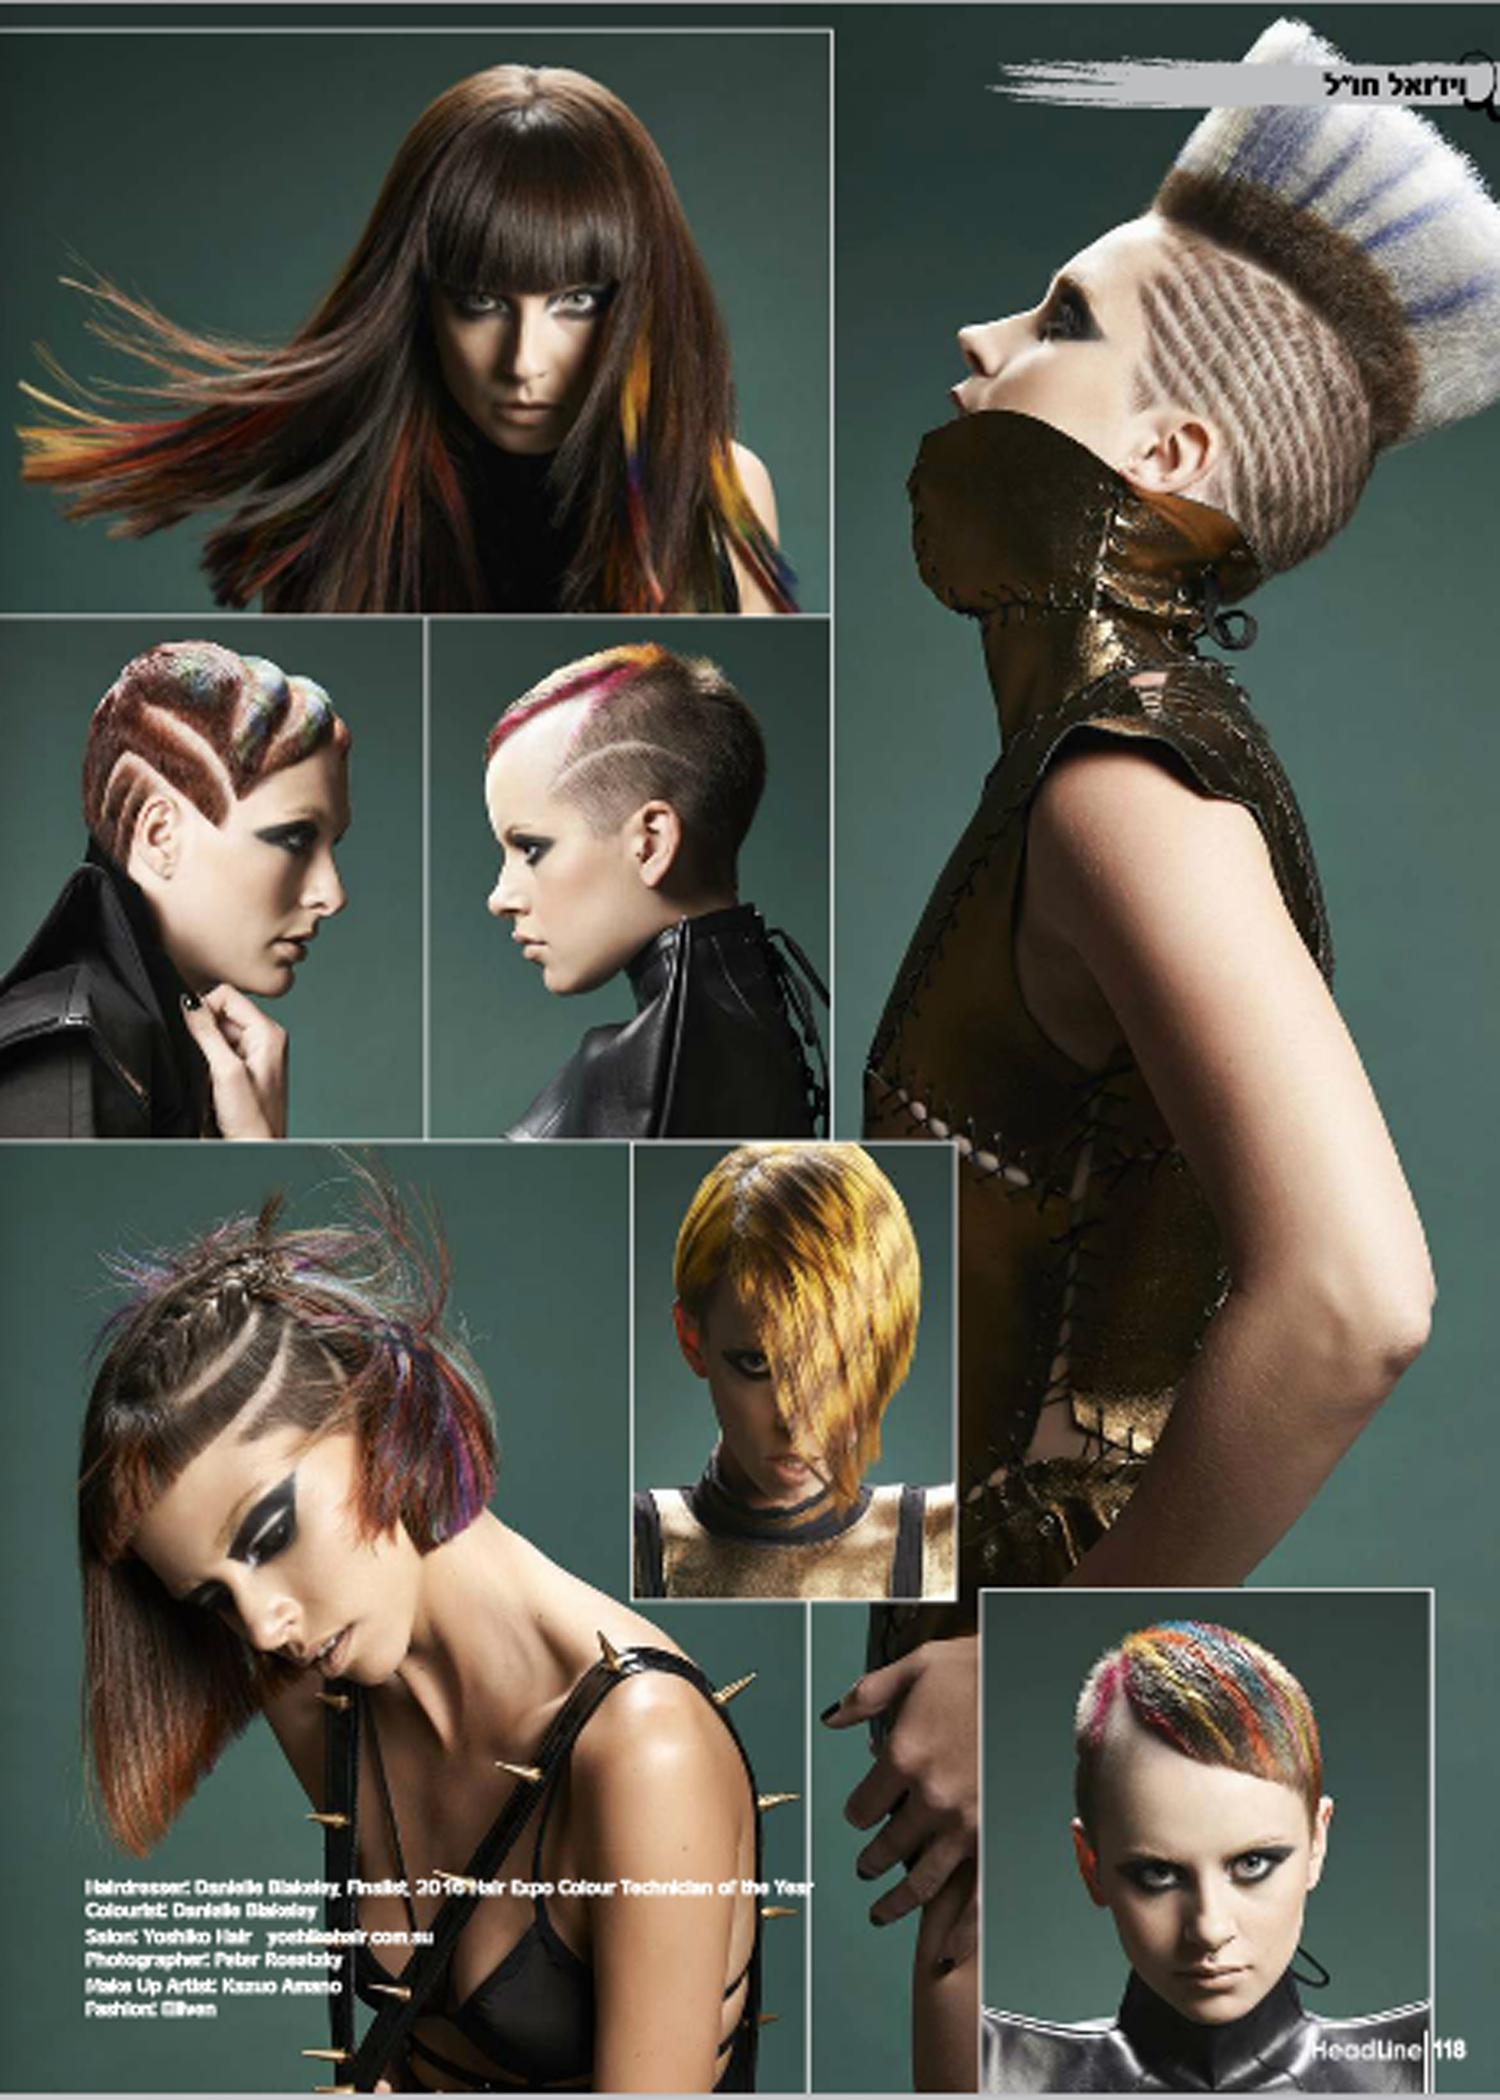 yoshikohair_stkilda_melbourne_hairdresser_hairsalon_headline17_1